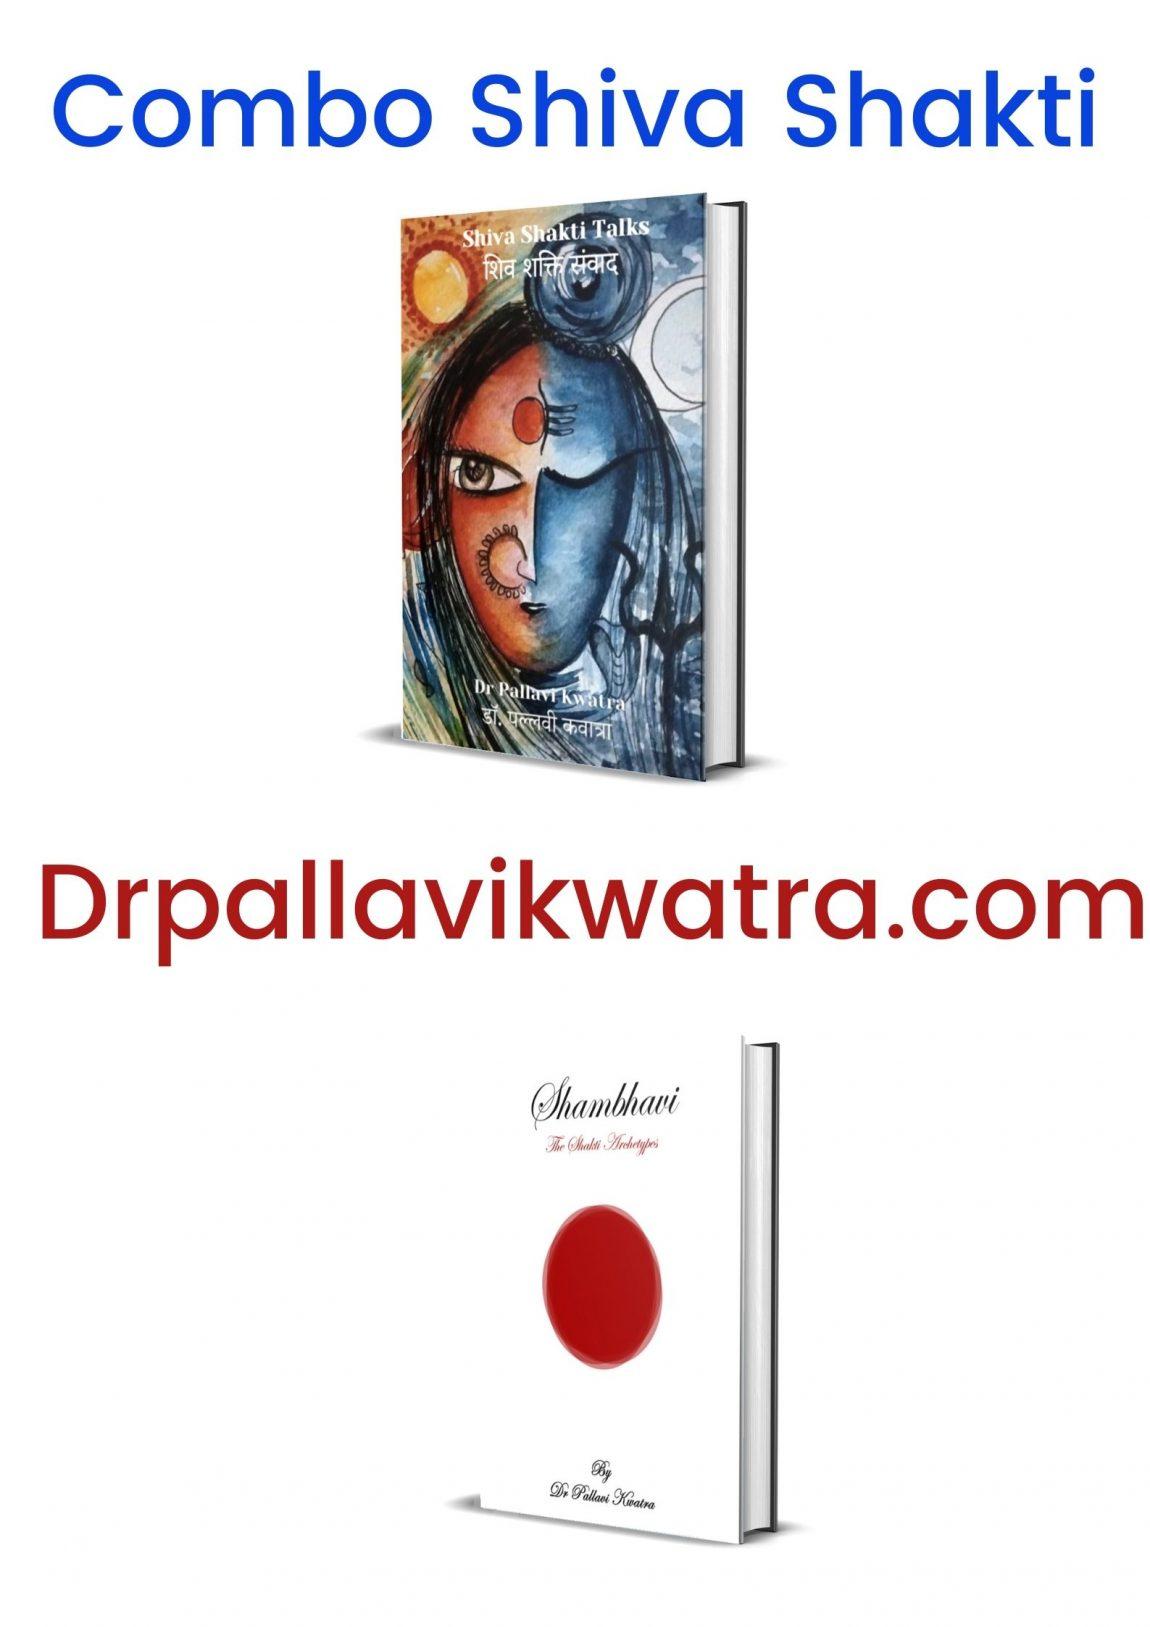 Combo-Shiva-Shakti-website.jpg